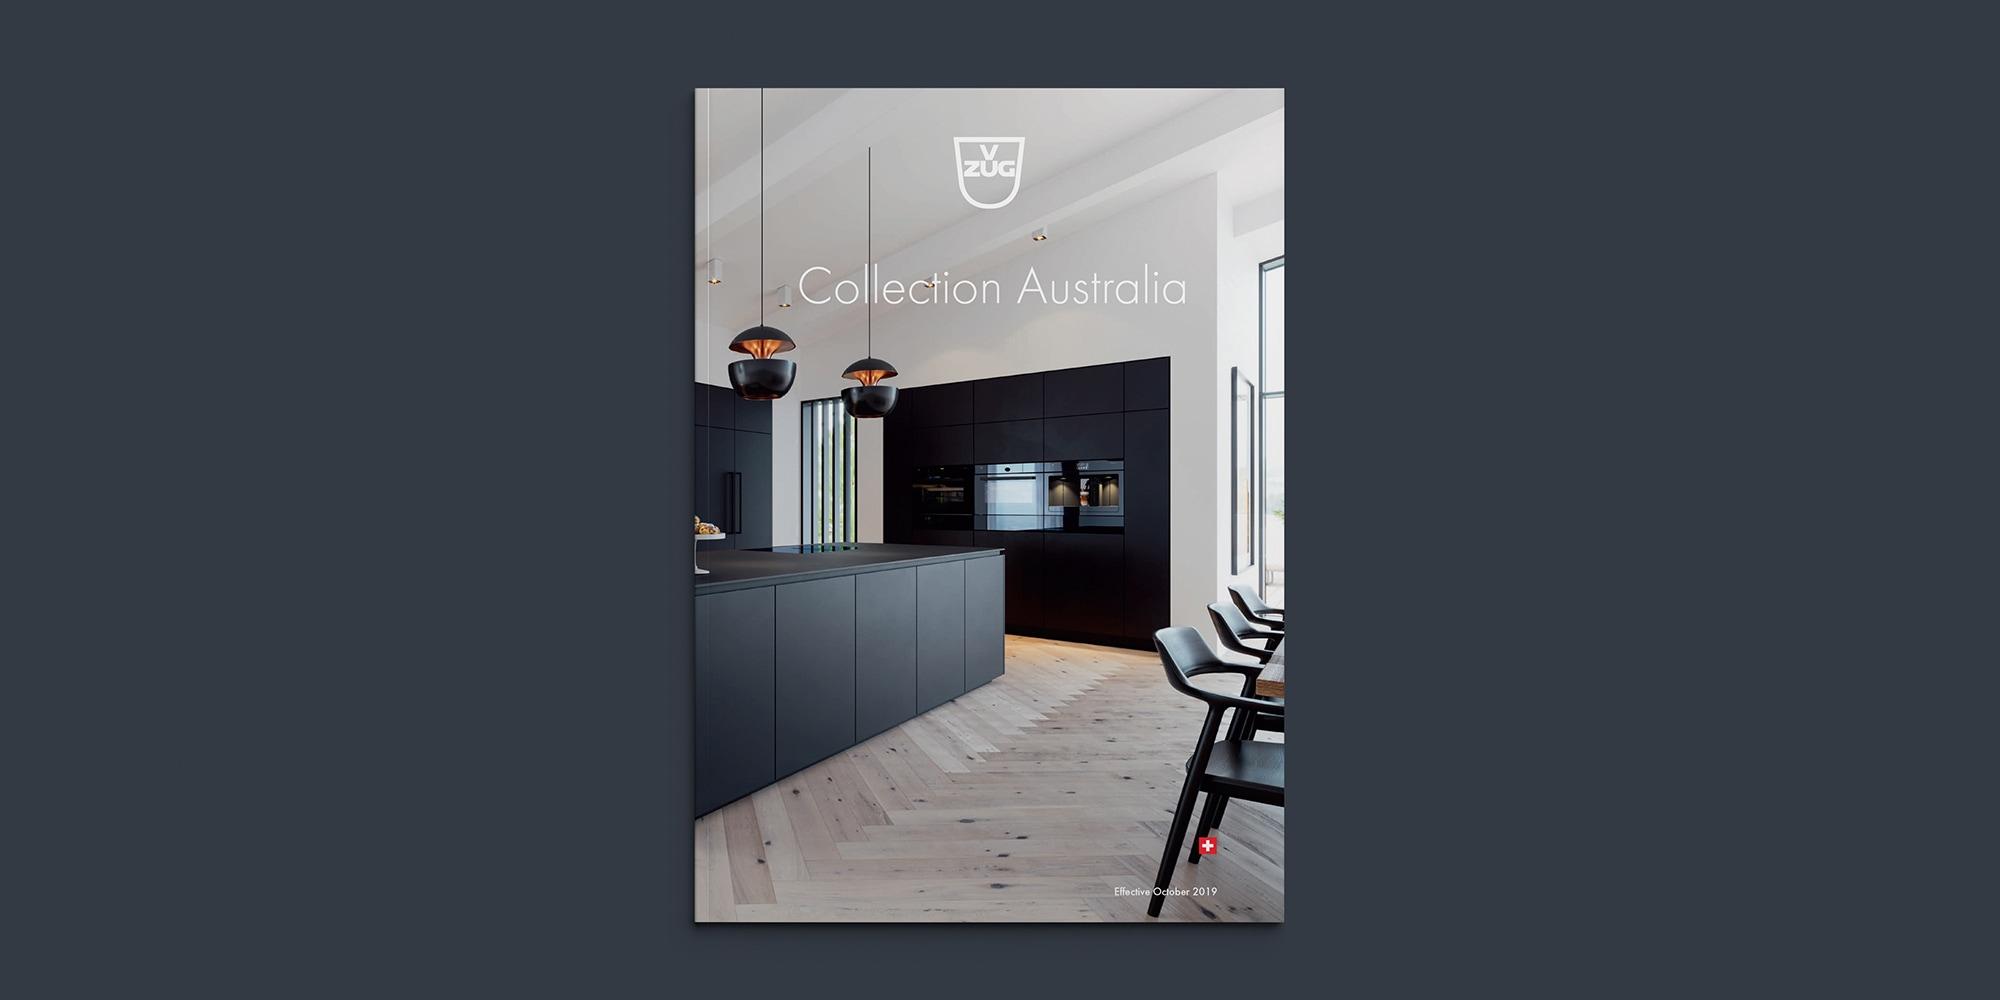 V-ZUG Collection Australia — Brand and Design Studio Melbourne